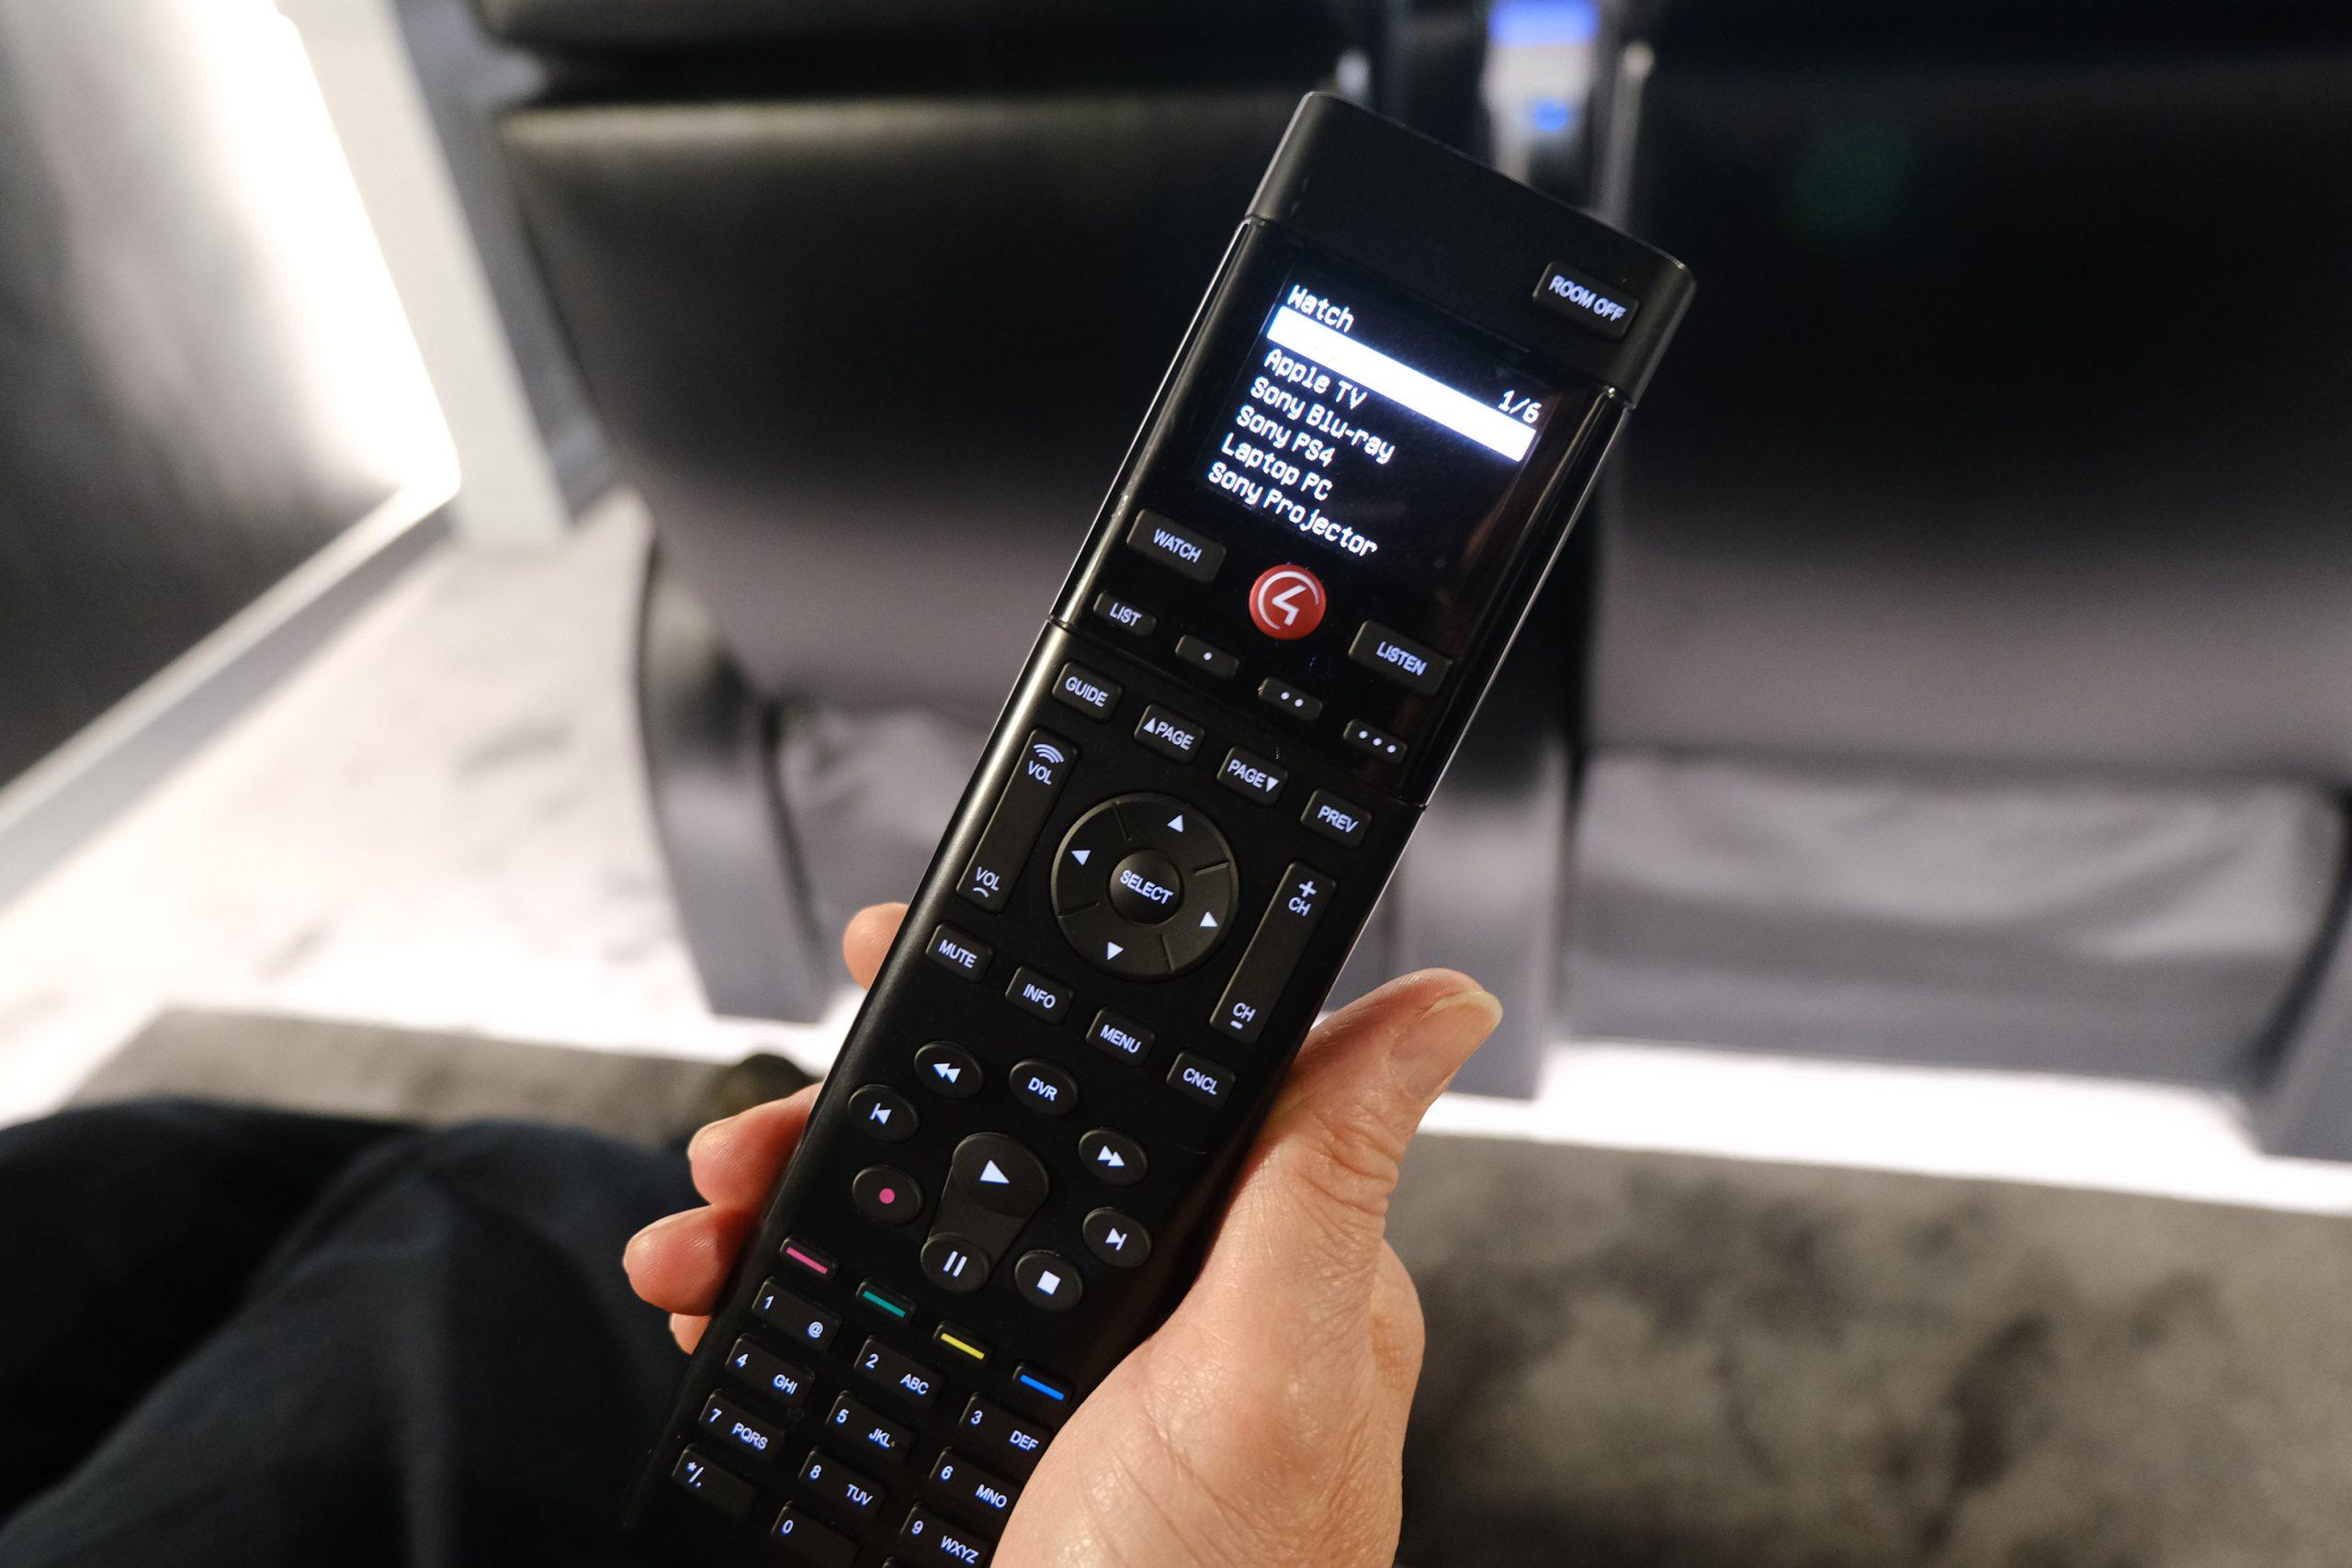 Control4 Home Cinema remote control